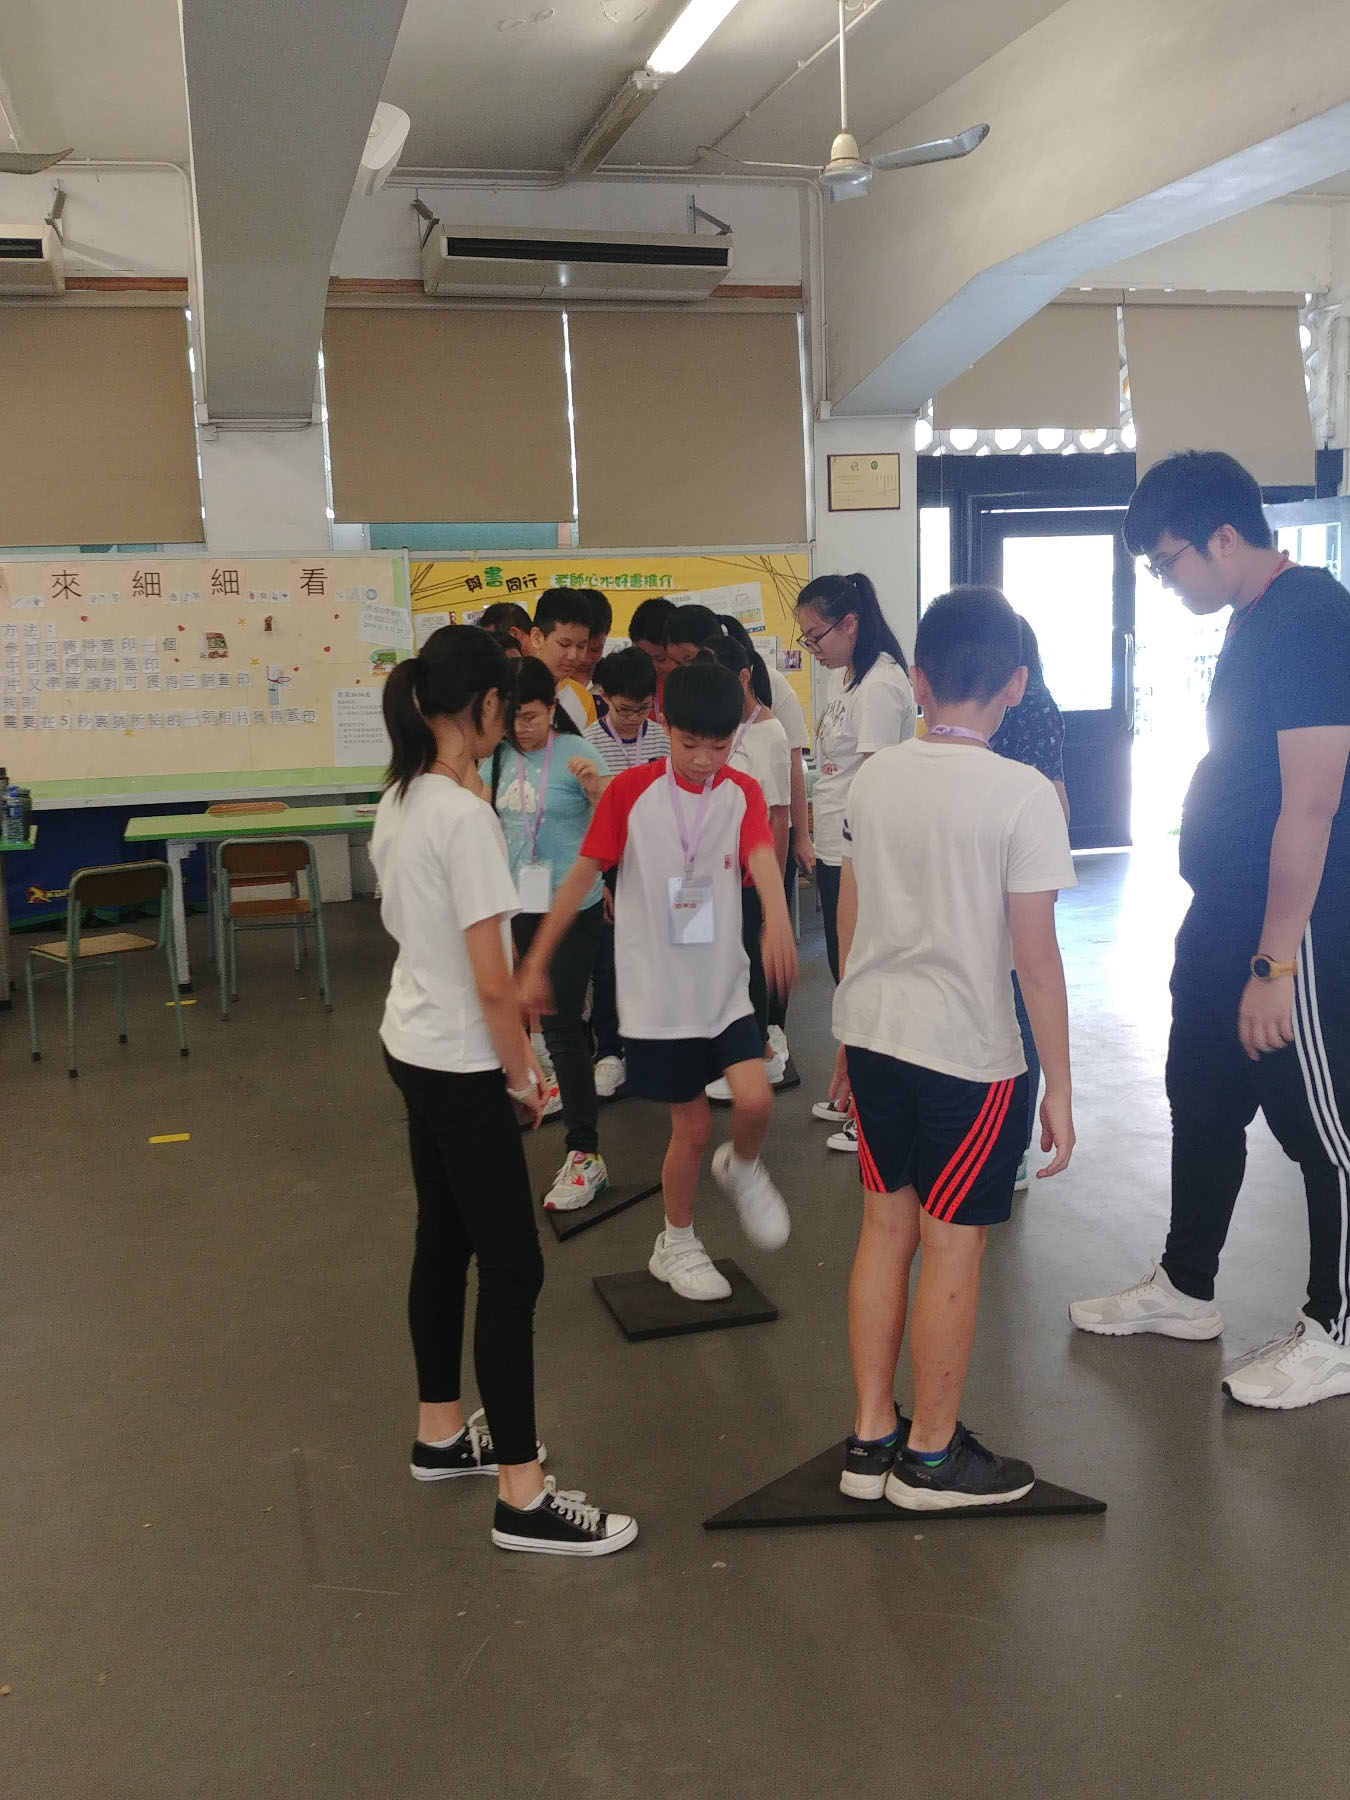 http://npc.edu.hk/sites/default/files/20190814_104916.jpg